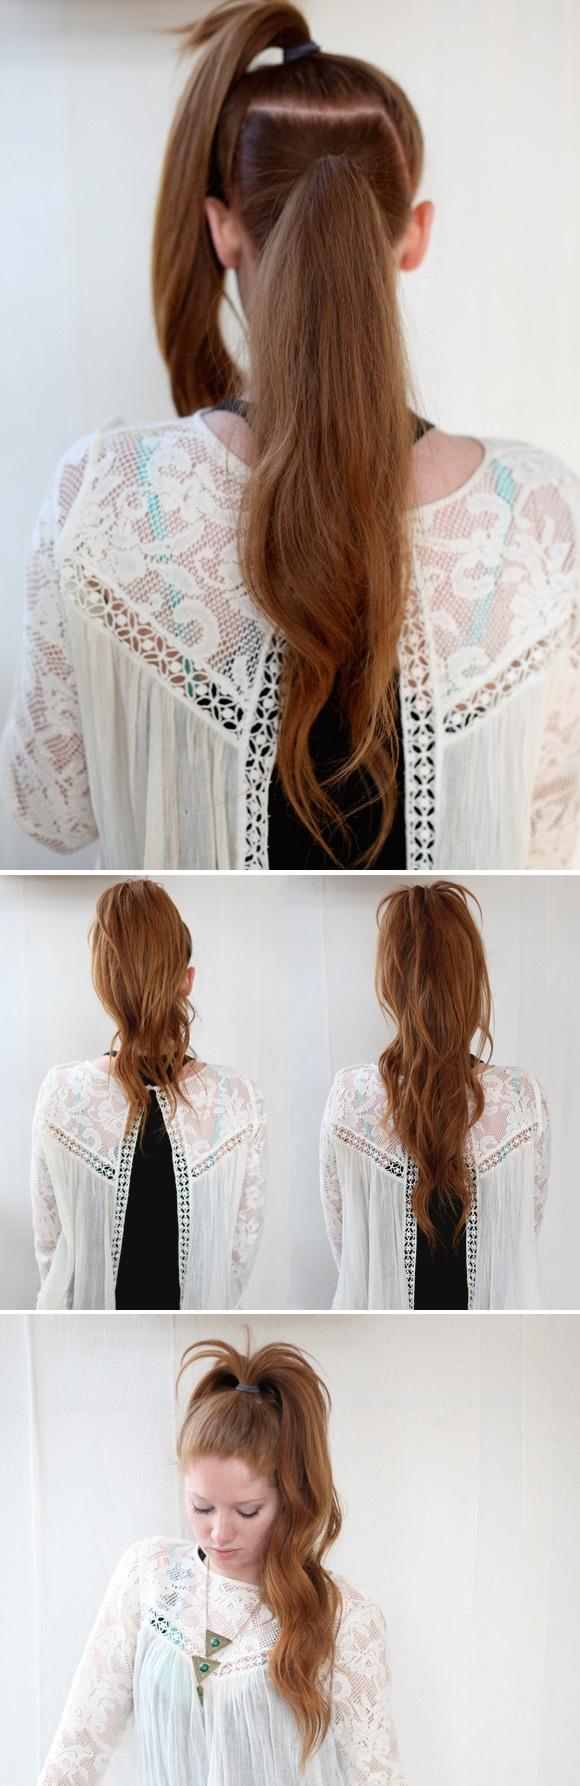 coiffures-express-13